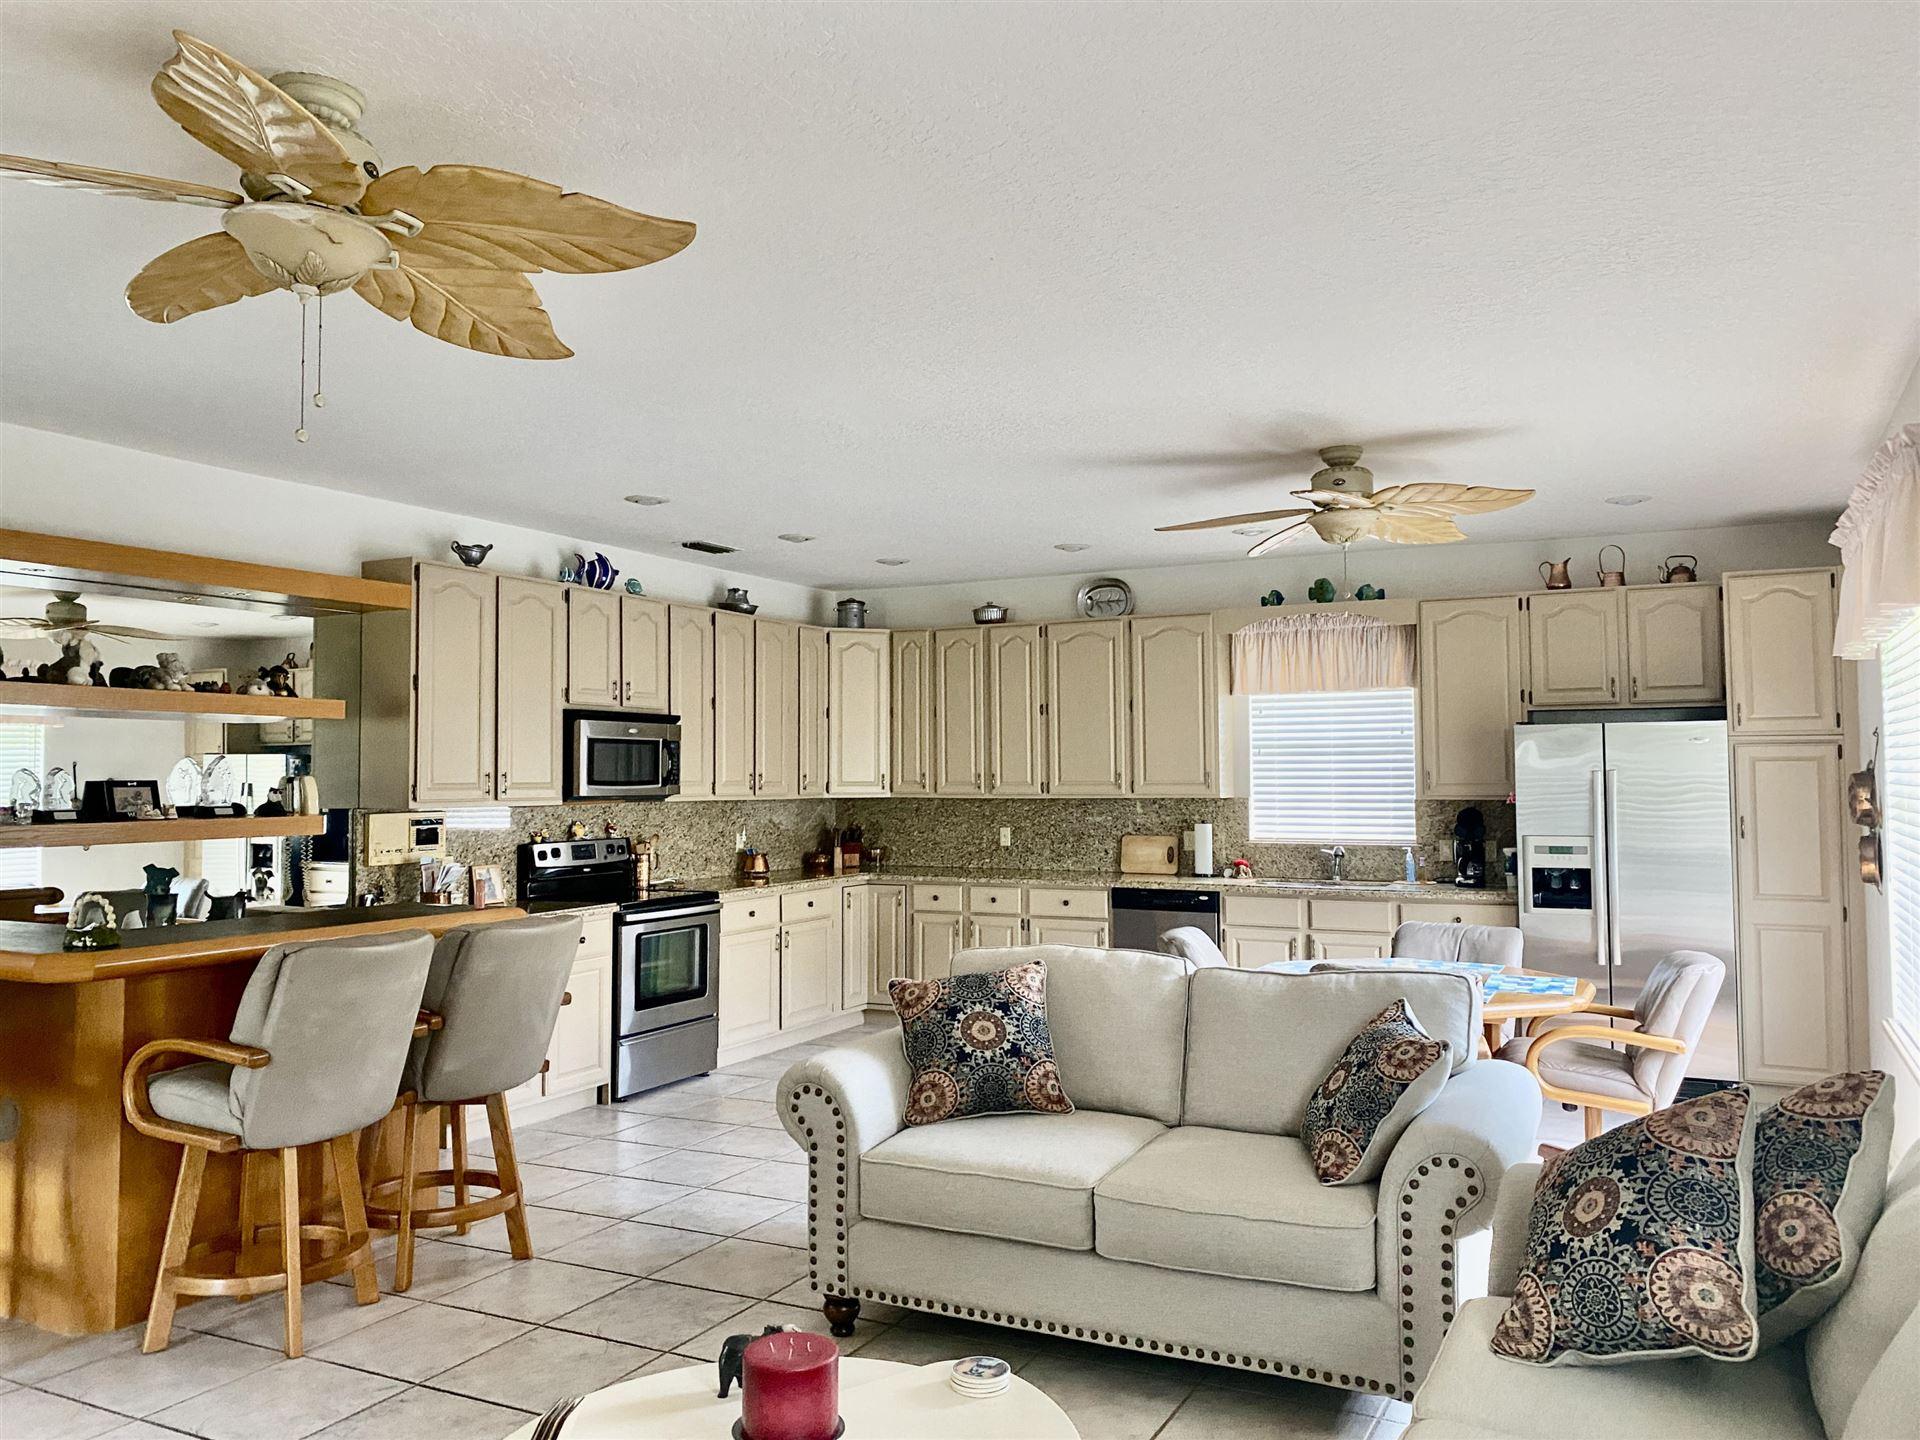 Photo of 434 SW Fairway Landing(s), Saint Lucie West, FL 34986 (MLS # RX-10720093)